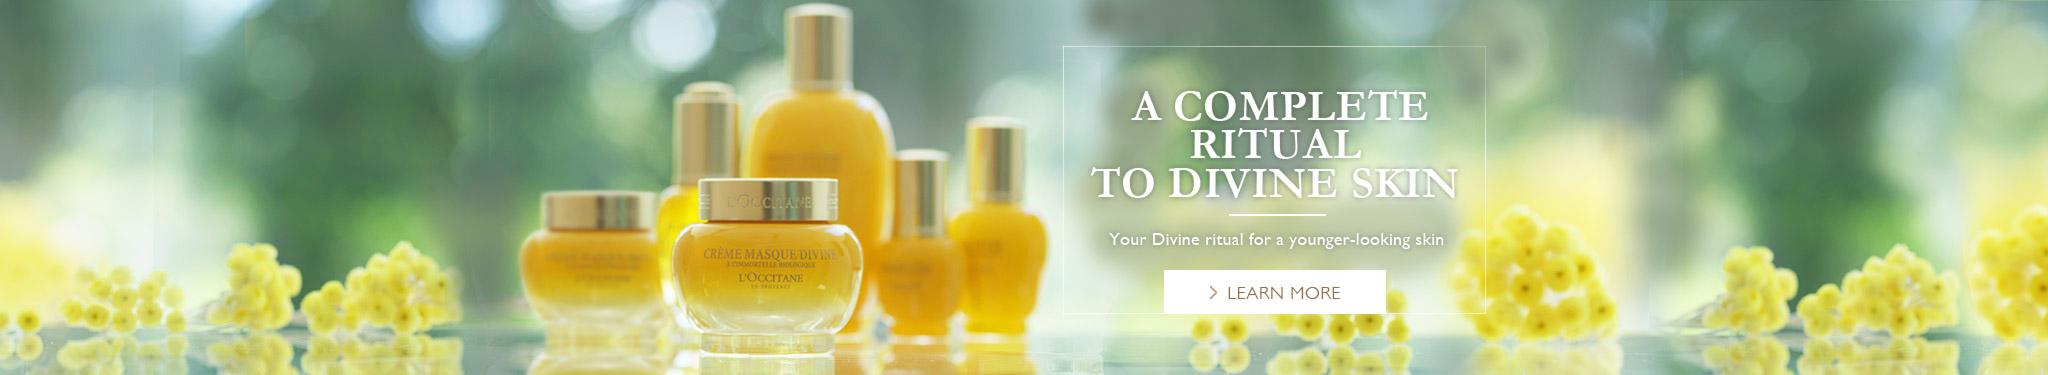 A complete ritual to Divine skin